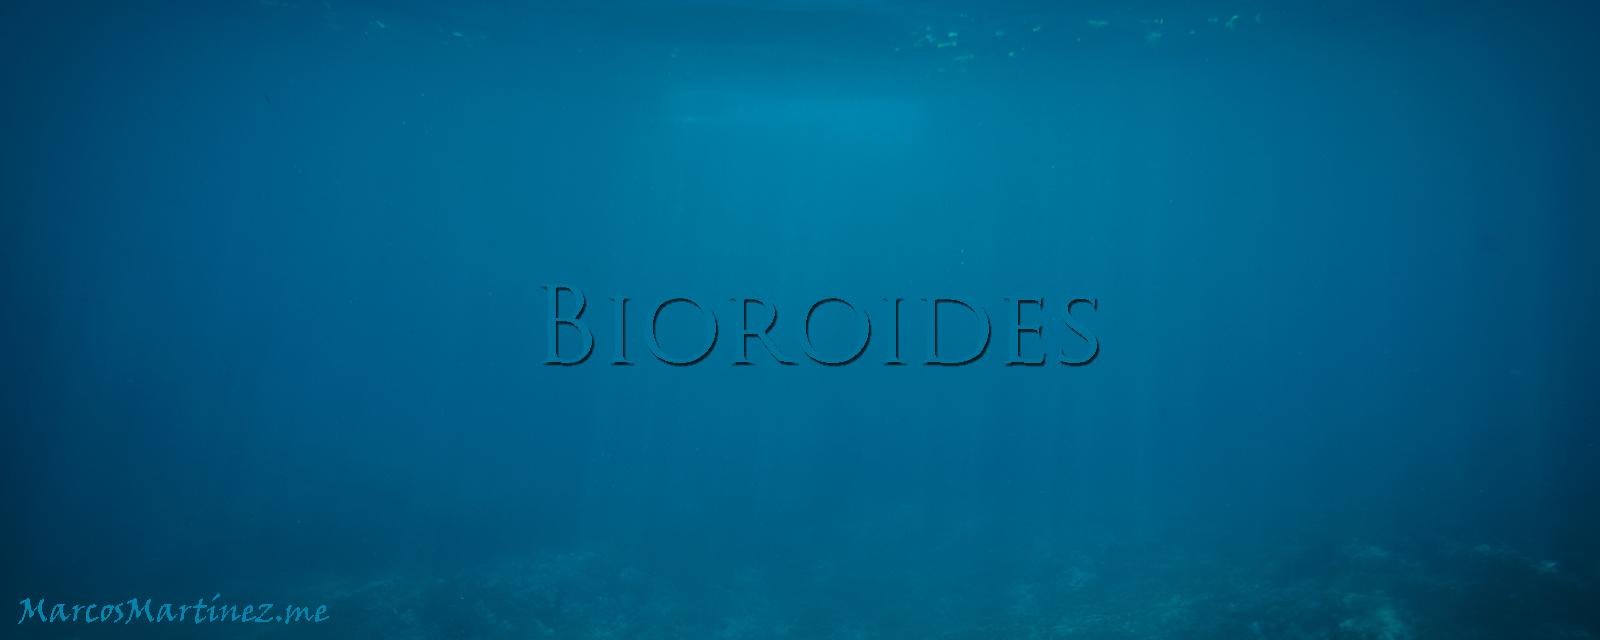 Bioroides